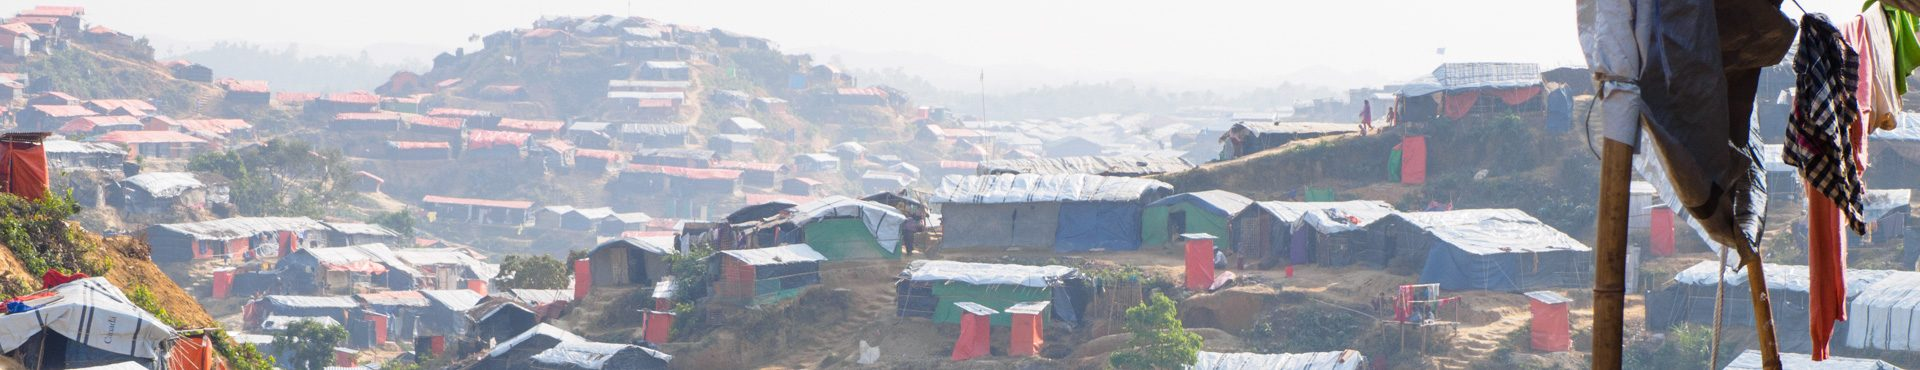 Rohingya Refugee Crisis Response